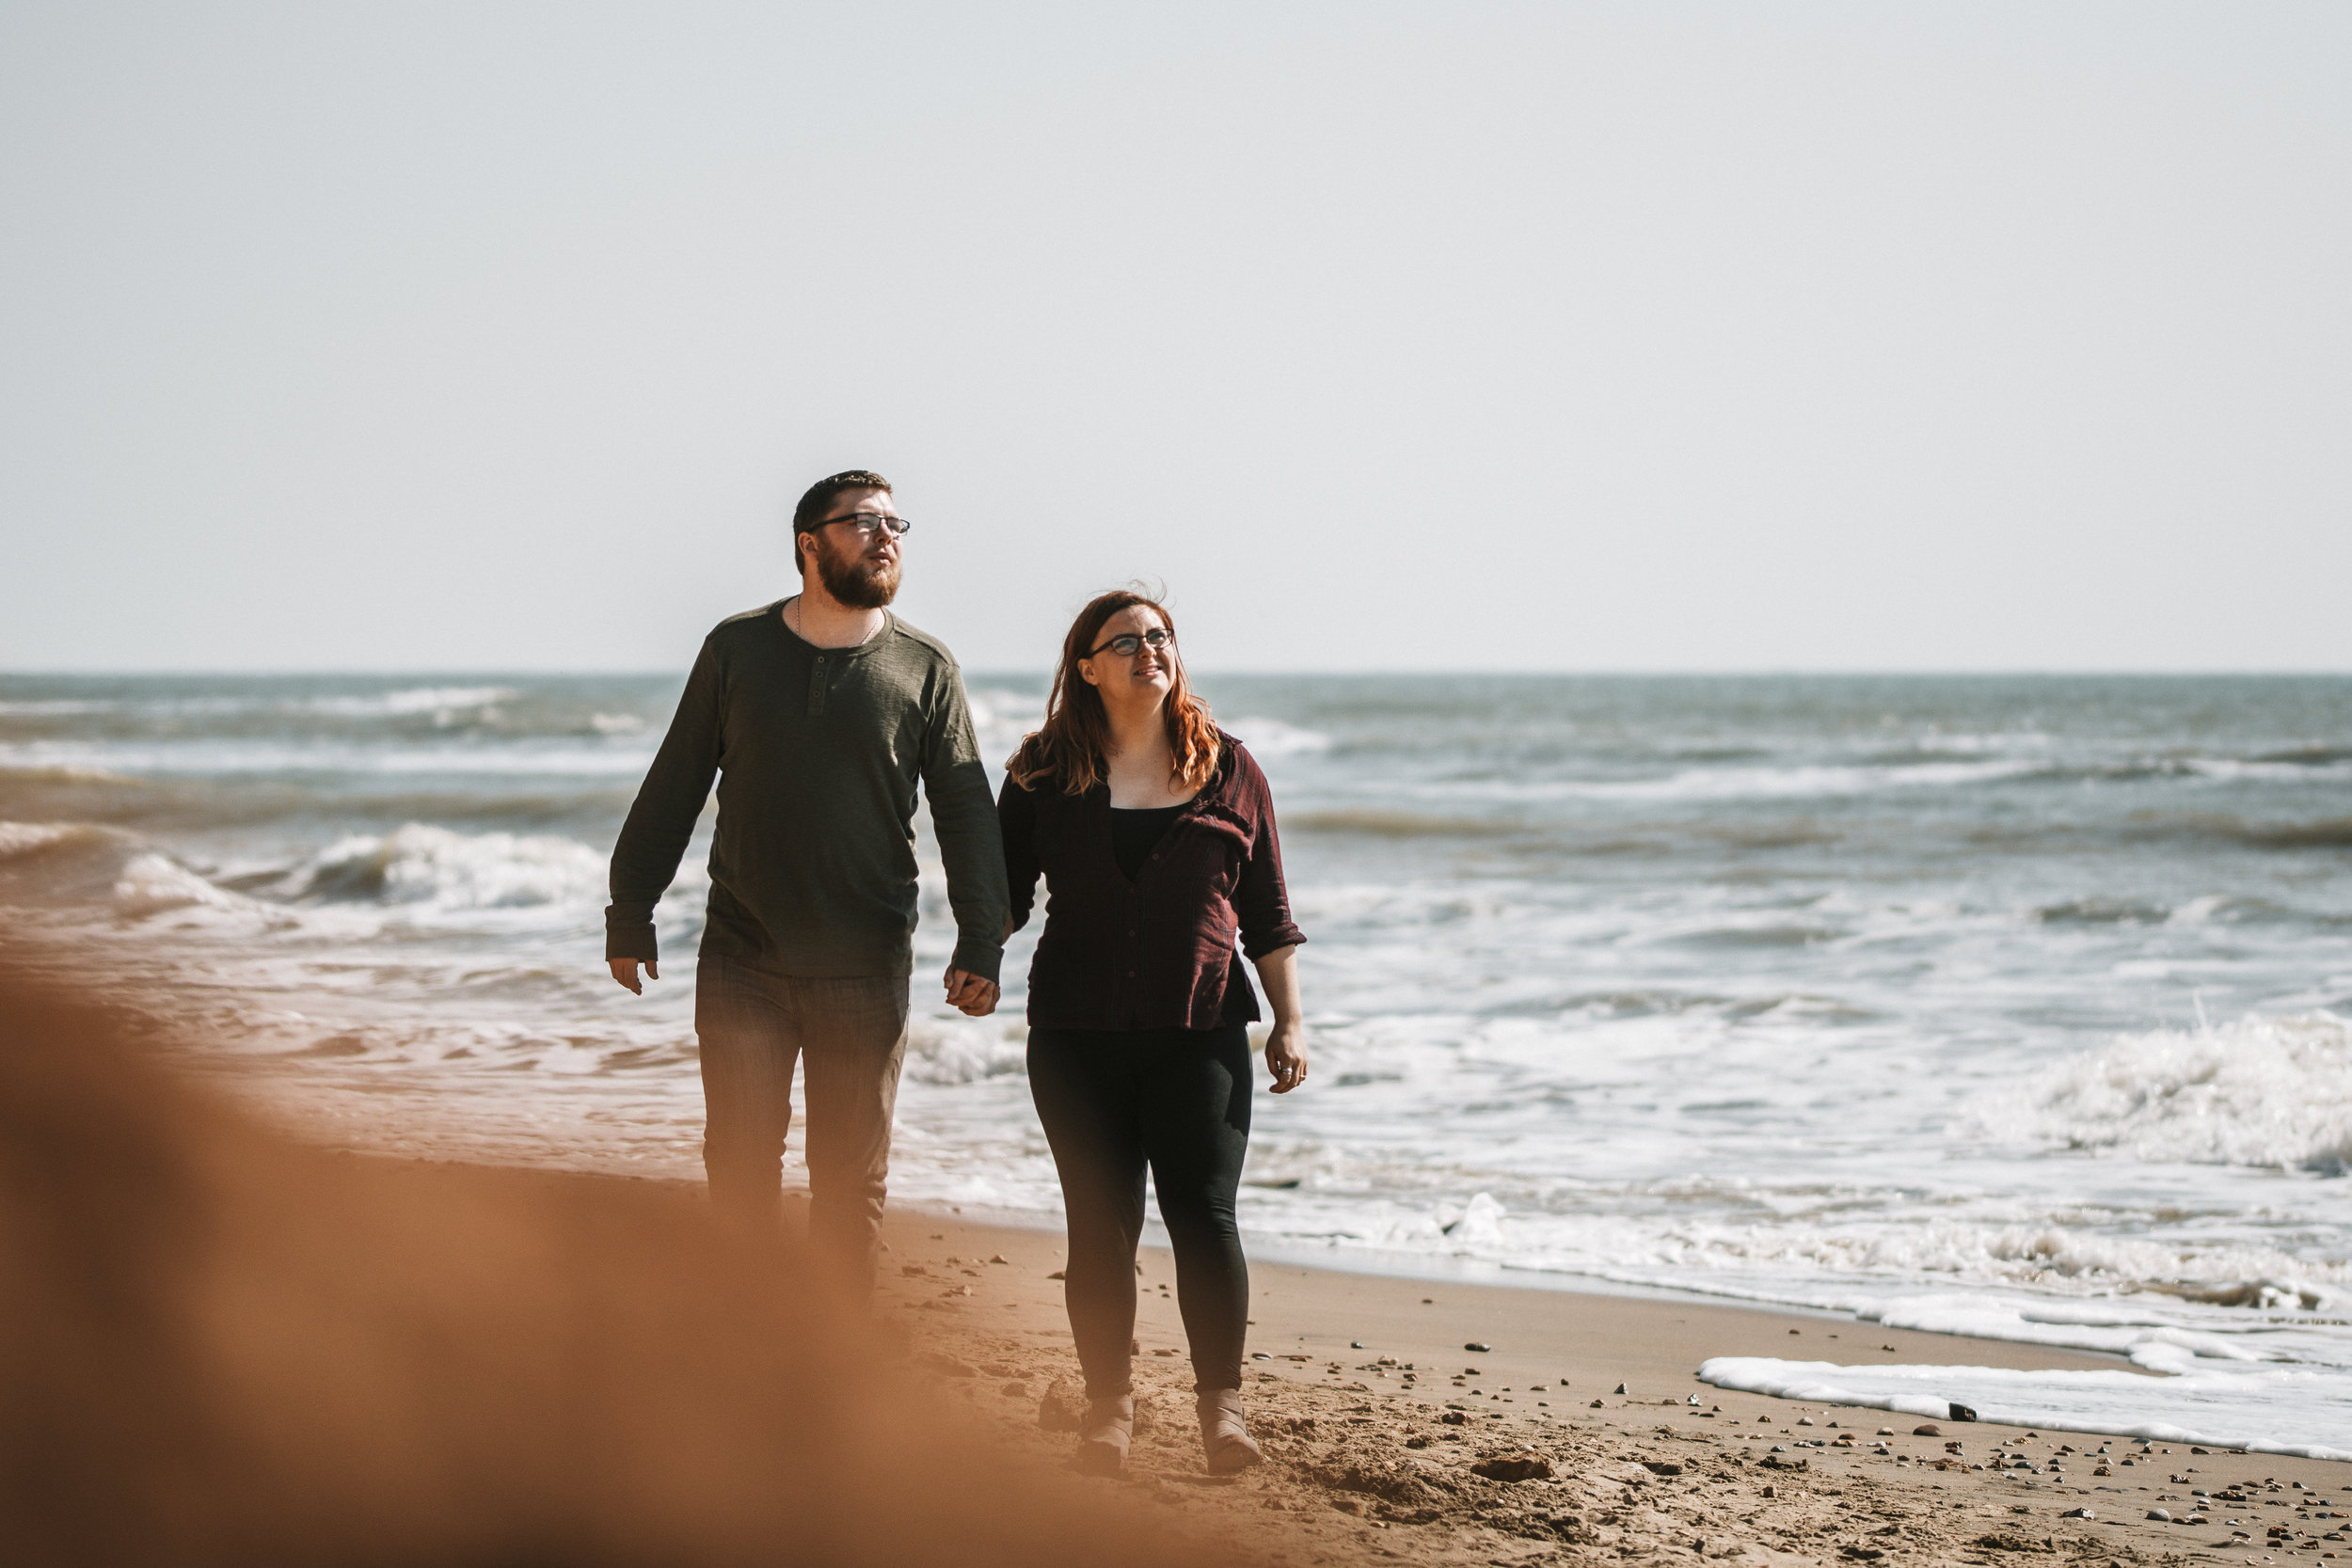 Beach Walk Engagement Photography.jpg